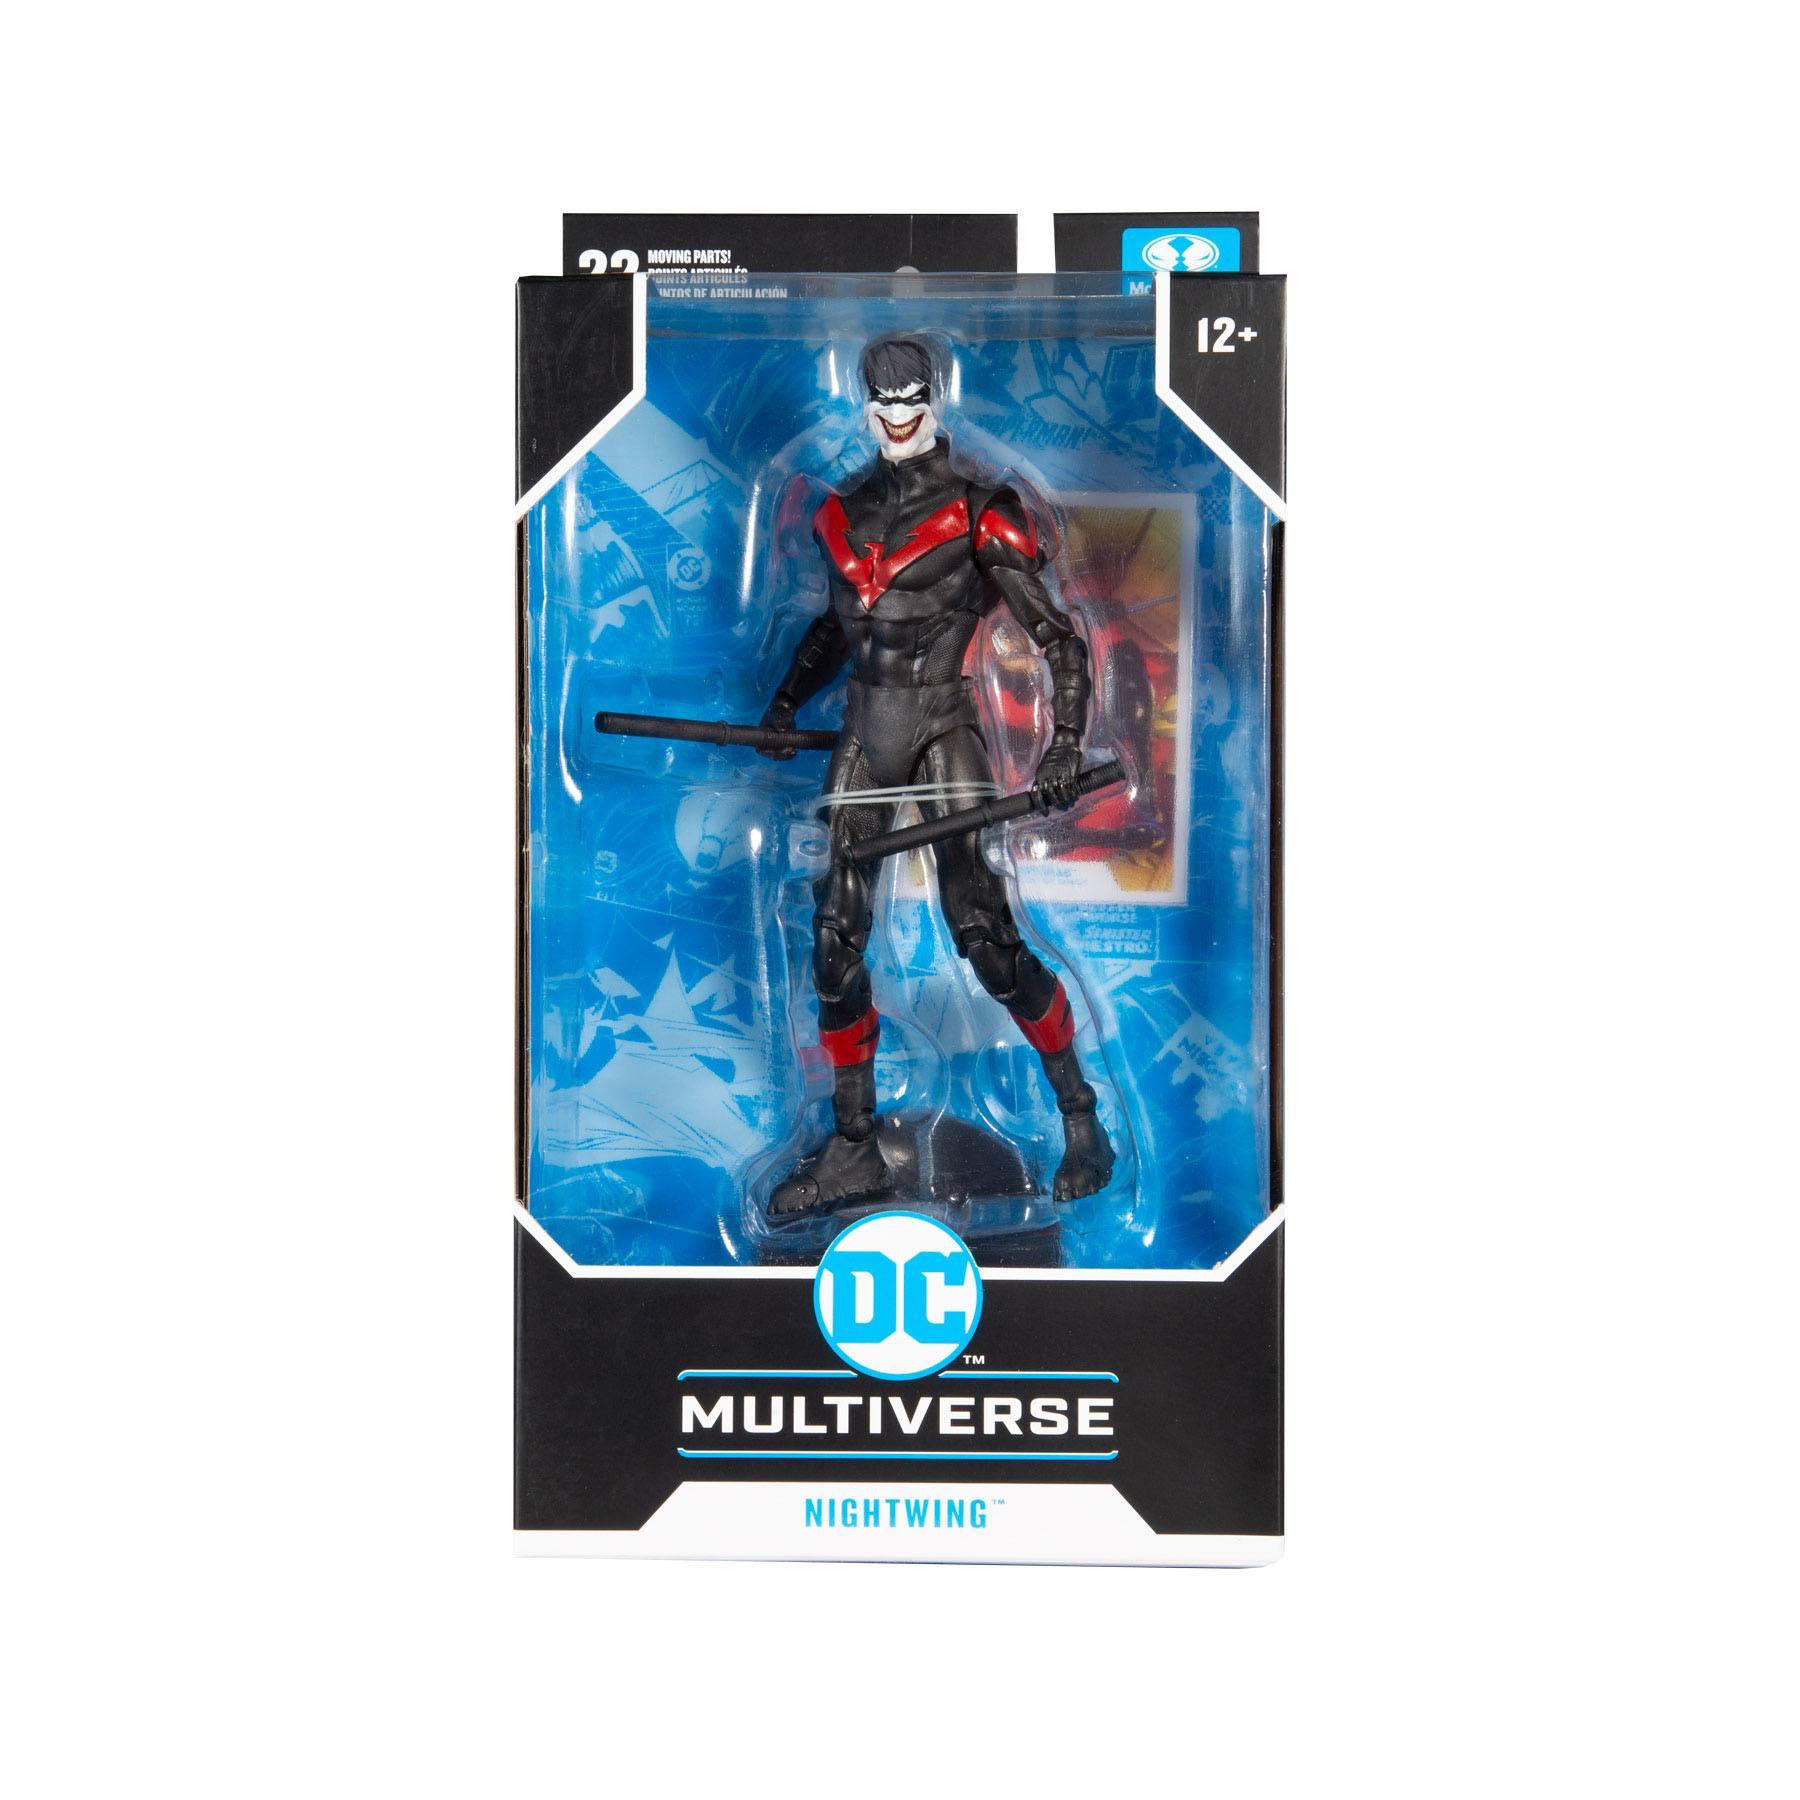 DC Multiverse Actionfigur Nightwing Joker 18 cm MCF15139-8 787926151398